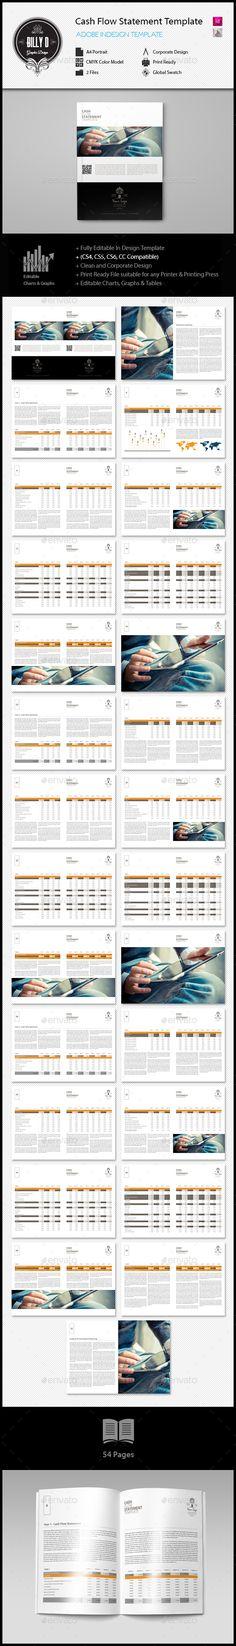 Advanced Financial Statement Analysis Templates In Docs And Excel   Statement  Analysis Template